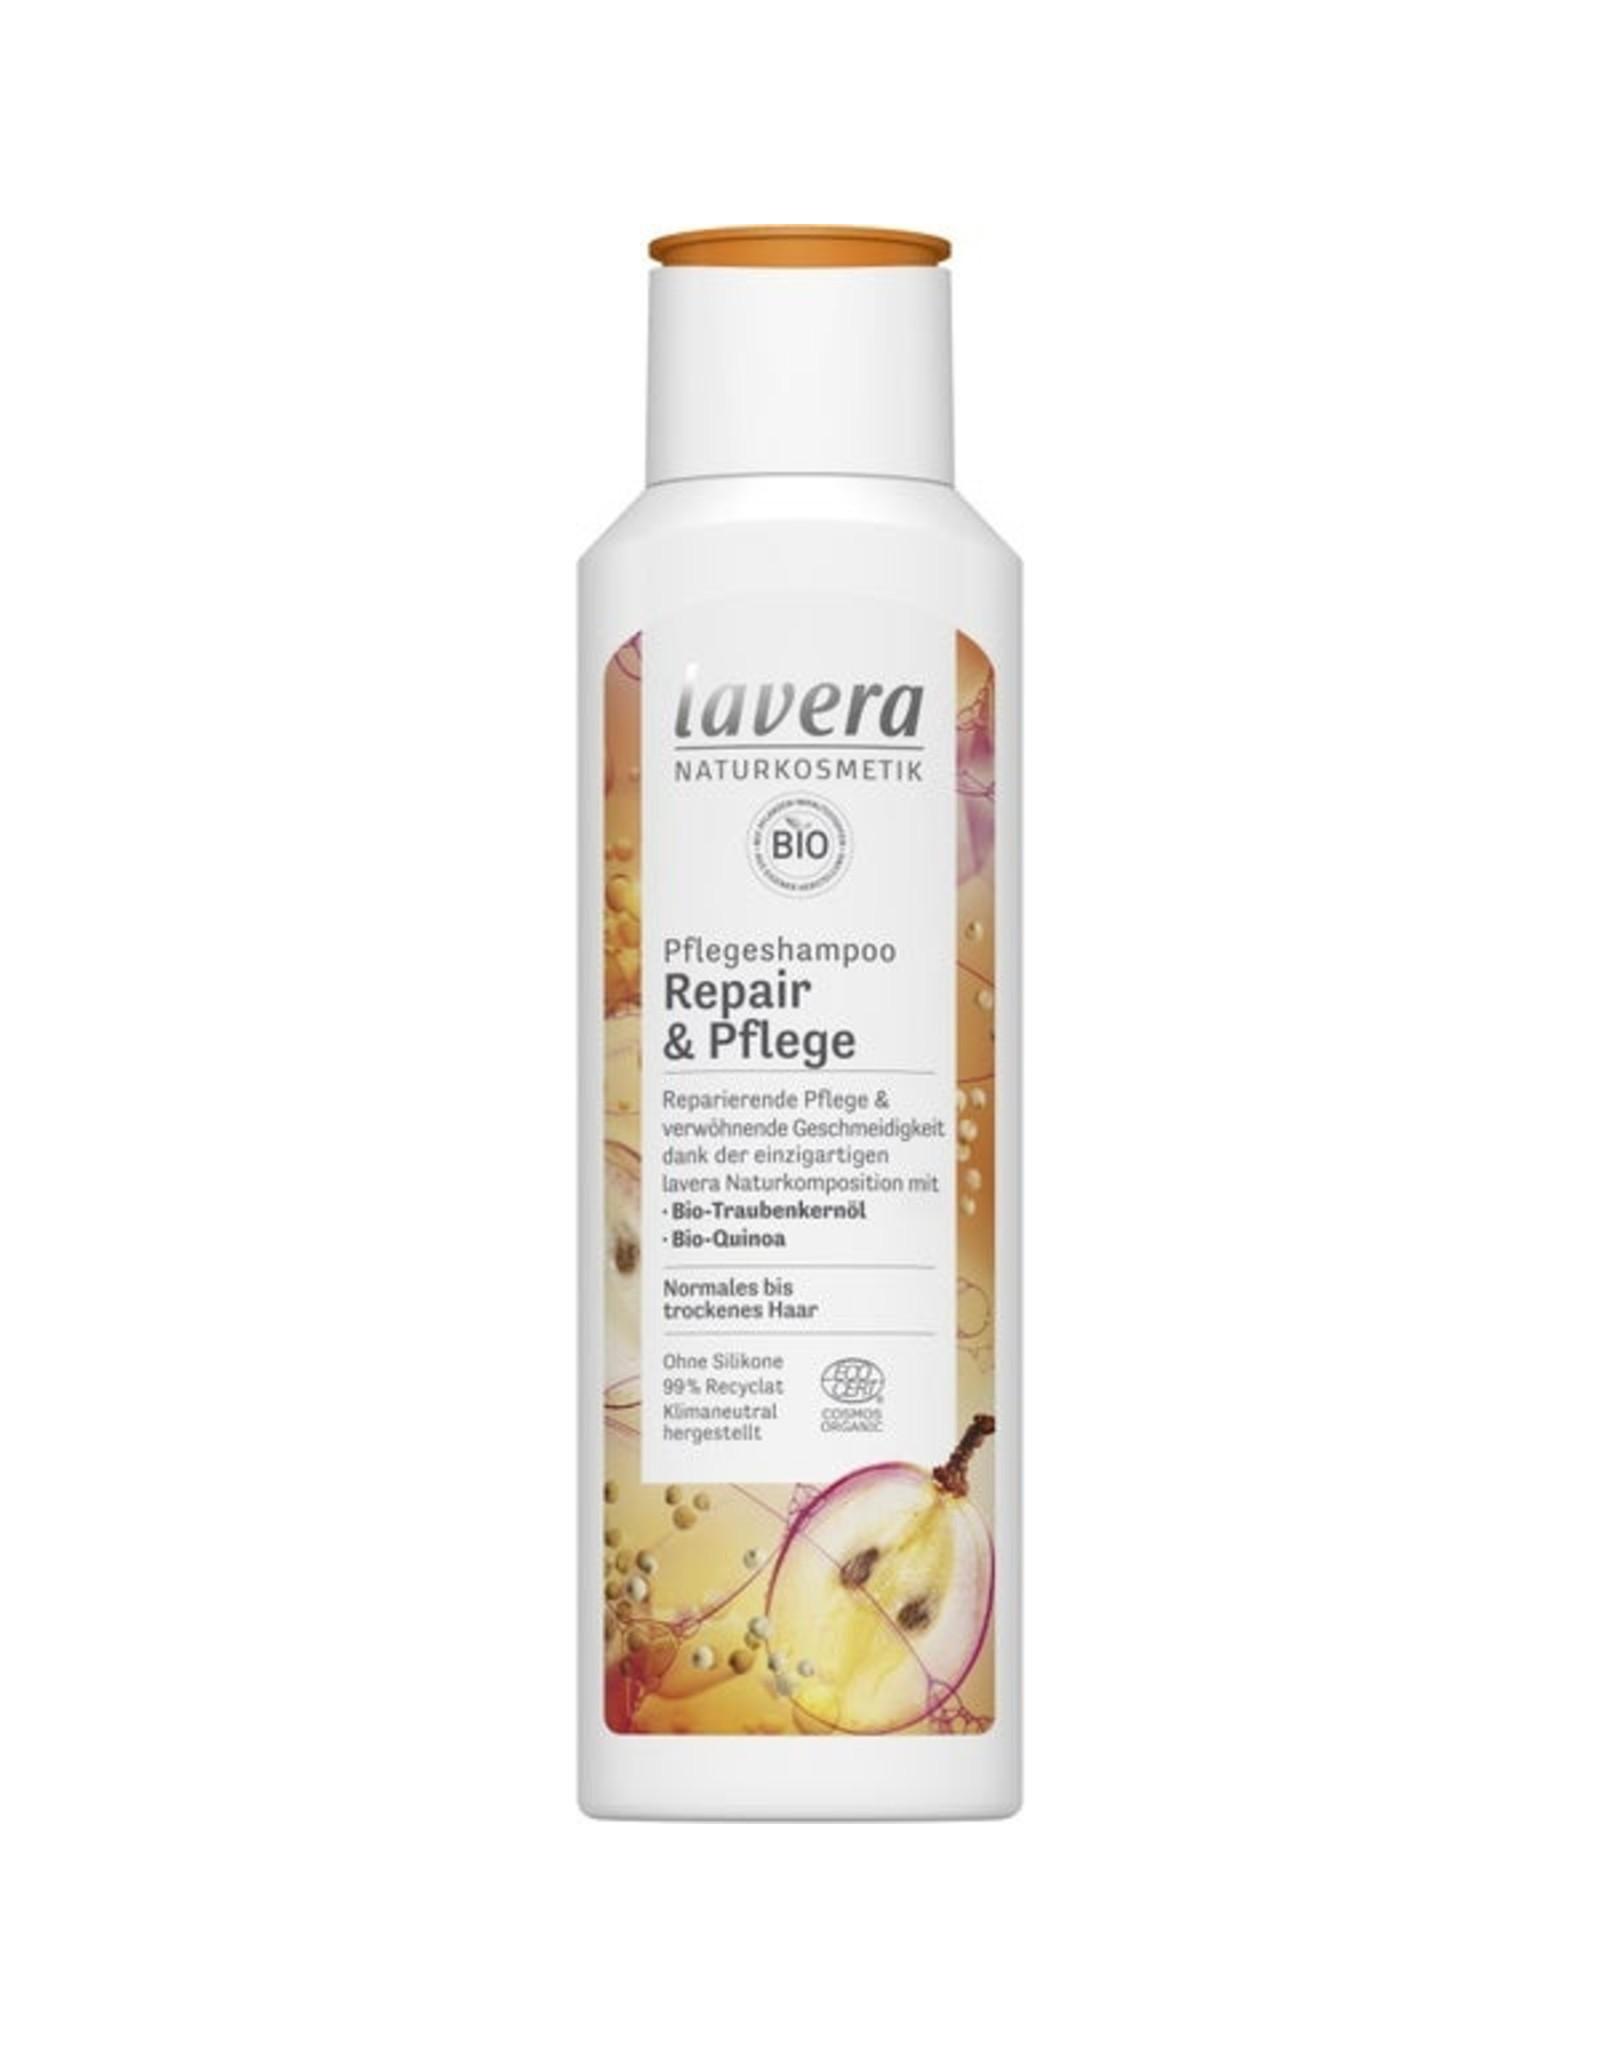 LAVERA Pflegeshampoo Repair & Pflege 250ml